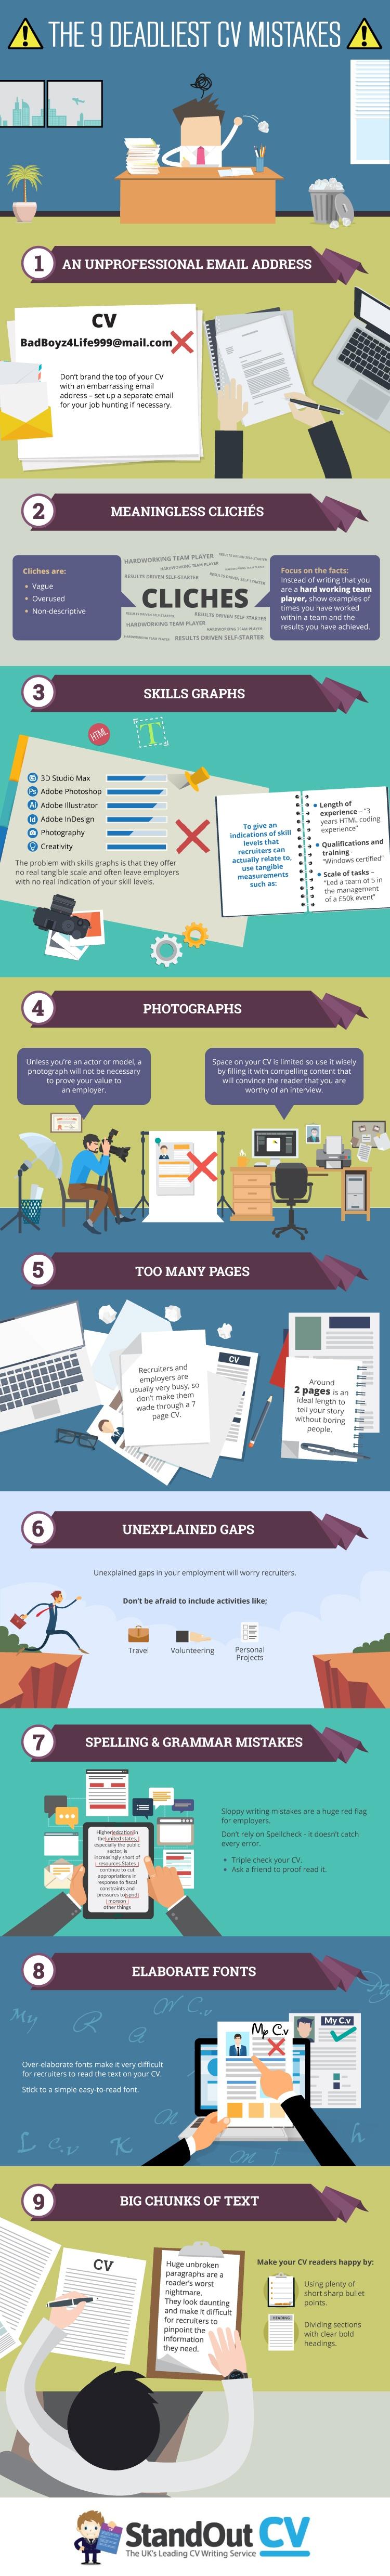 worst-resume-mistakes-infographic.jpg